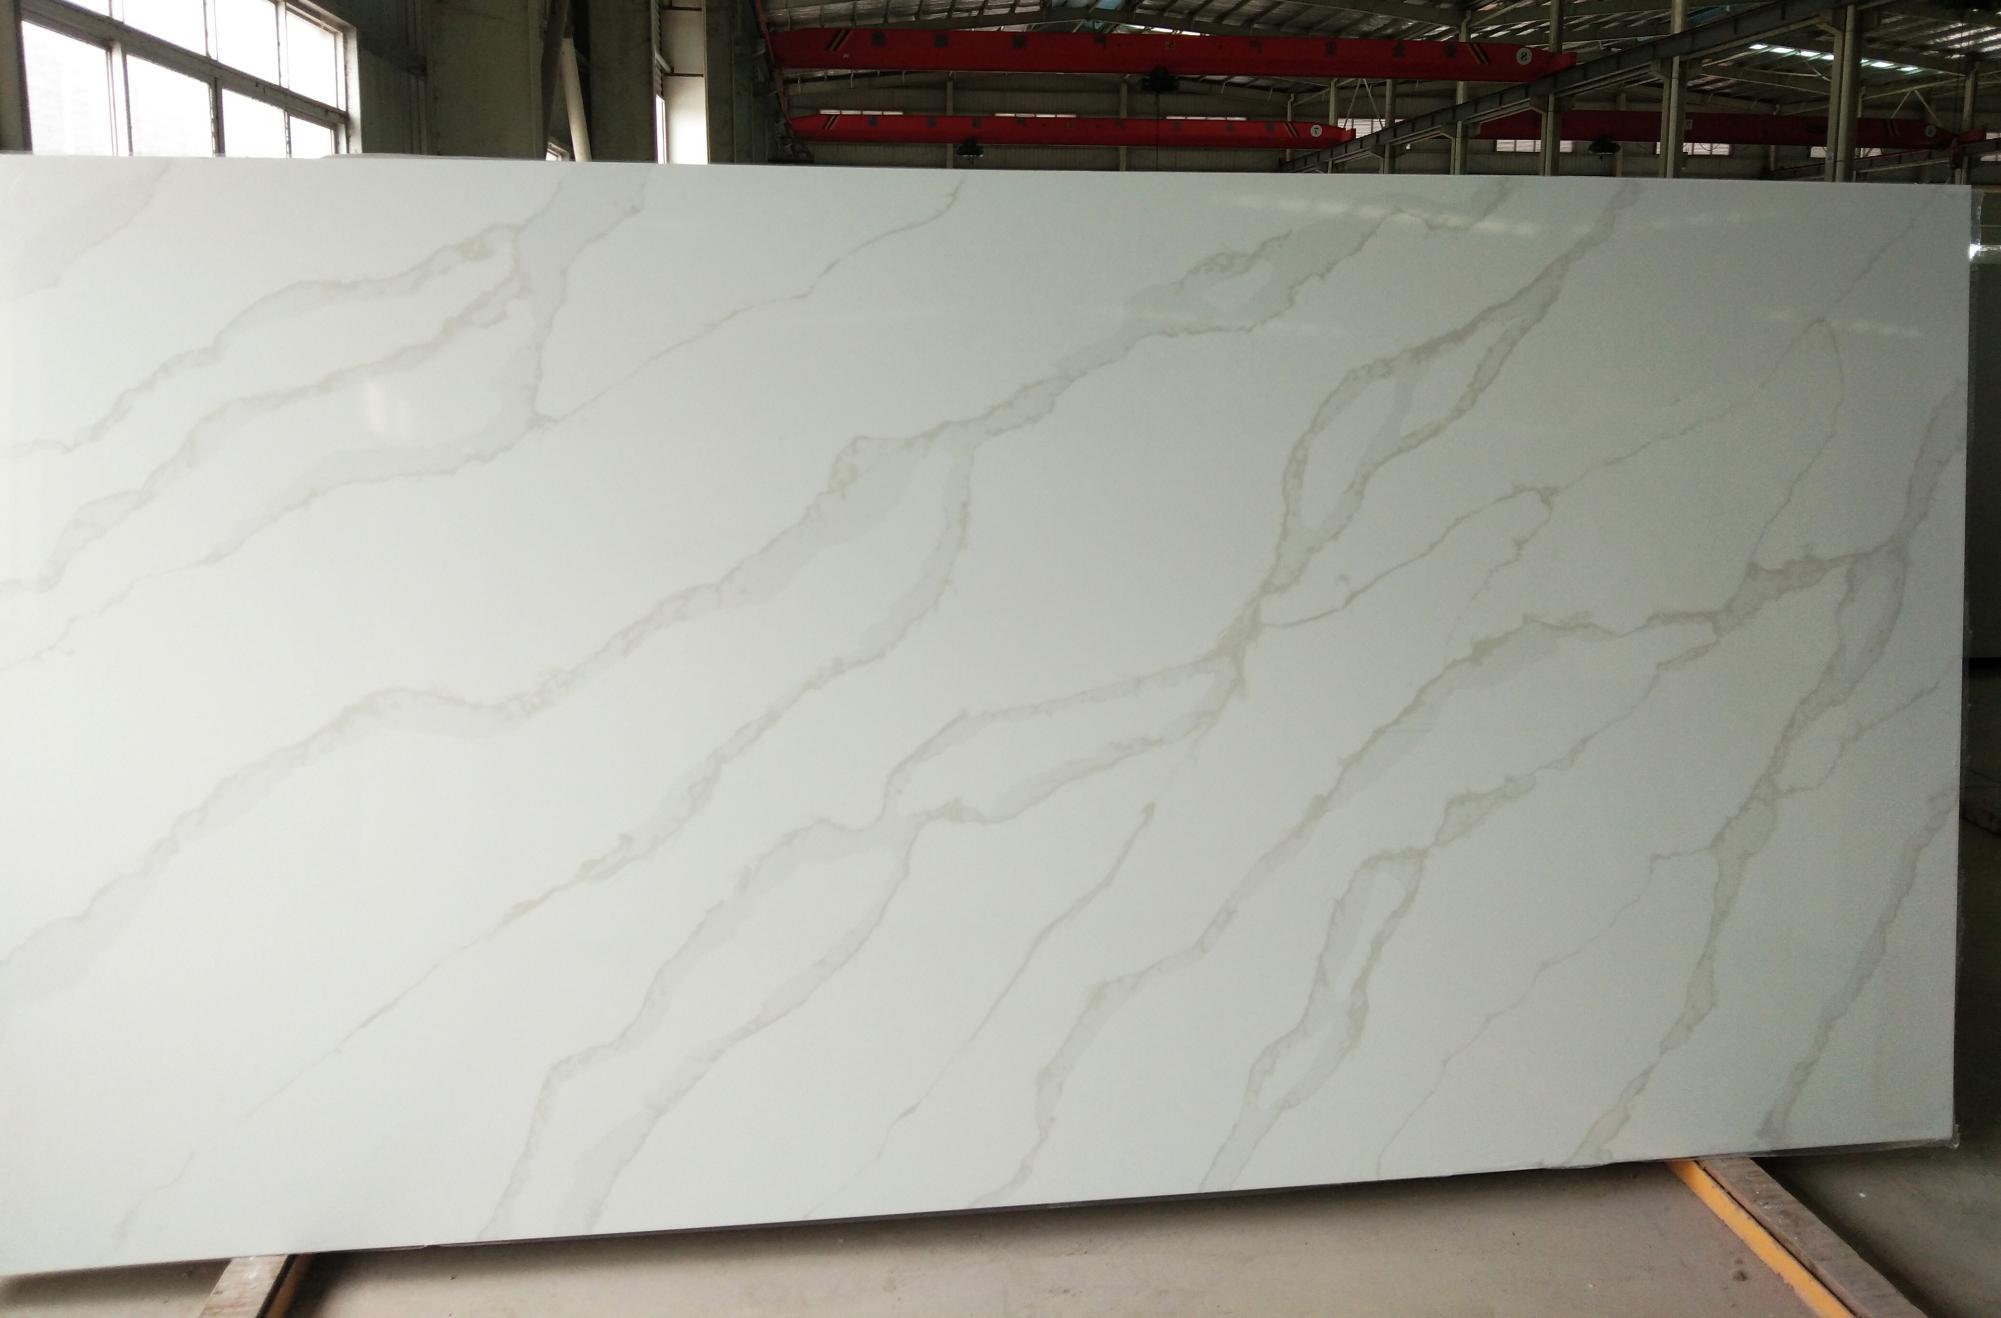 TIRRENO Supply Hai Phong (Vietnam) polished slabs AB 9331 , SL2CM artificial aglo quartz